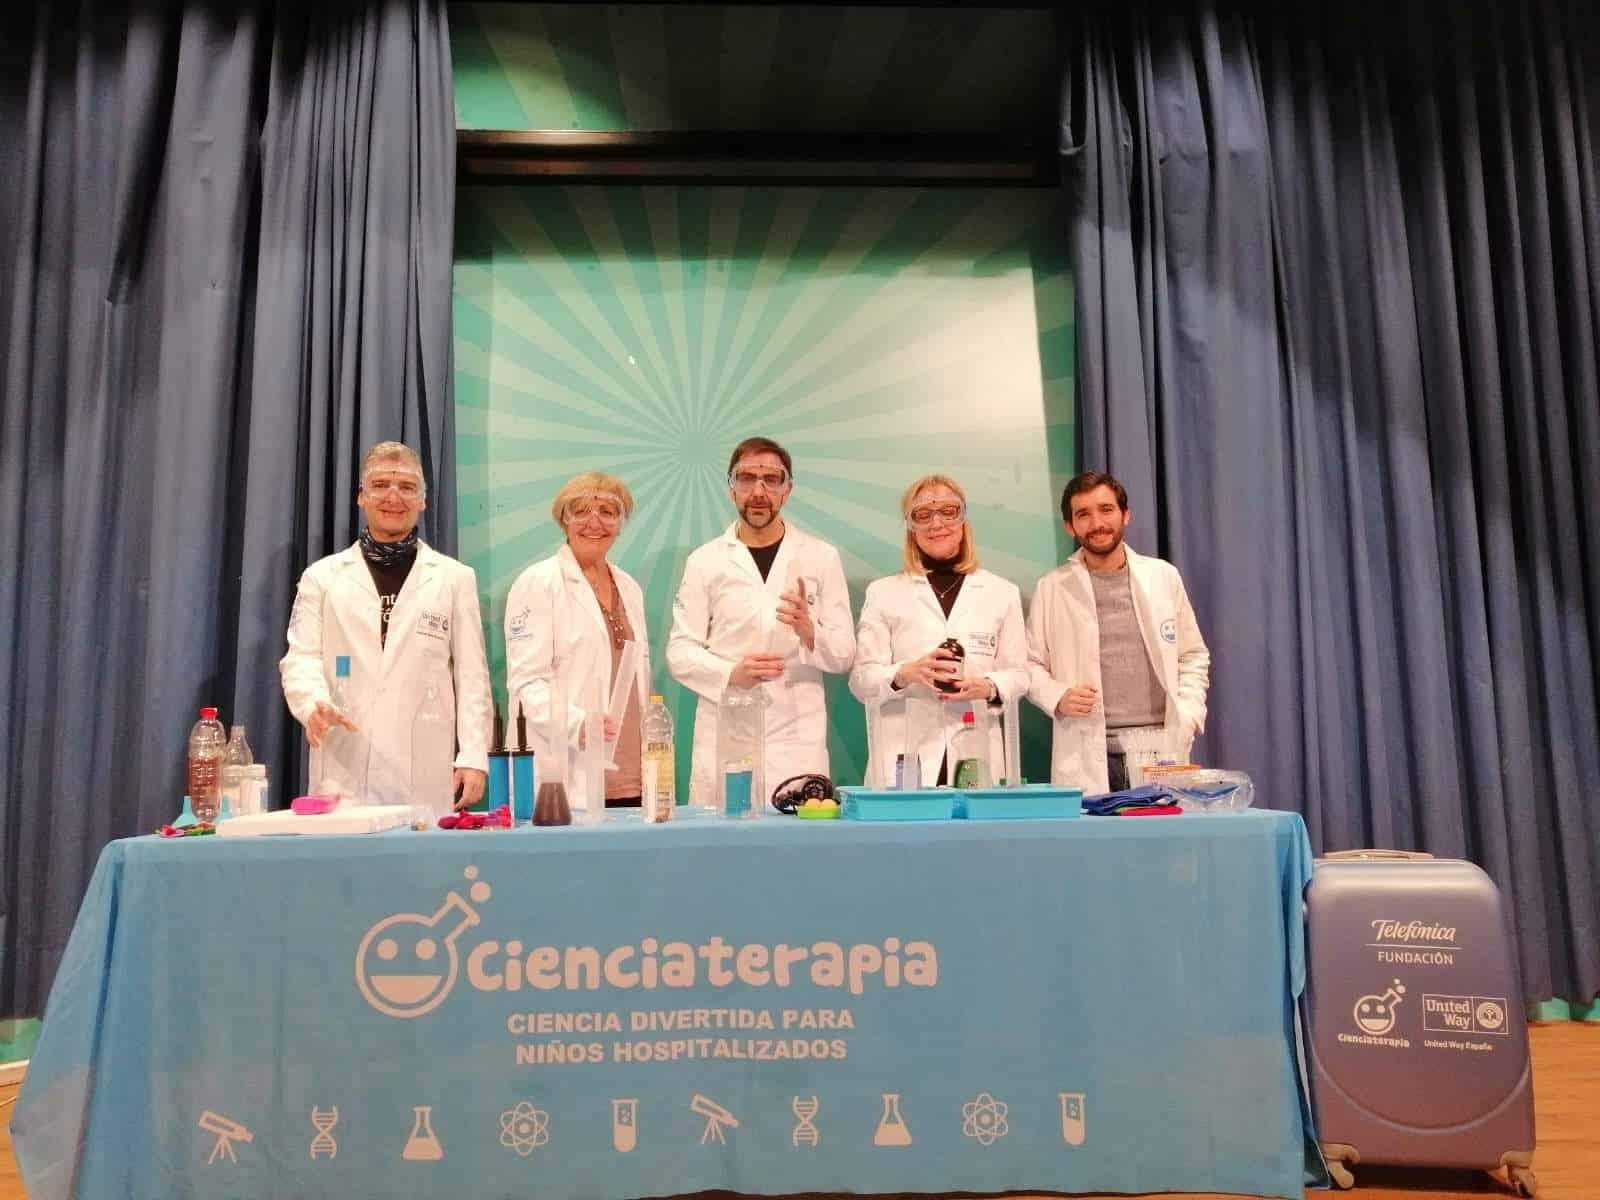 united way ciencia para ninos hospitalizados